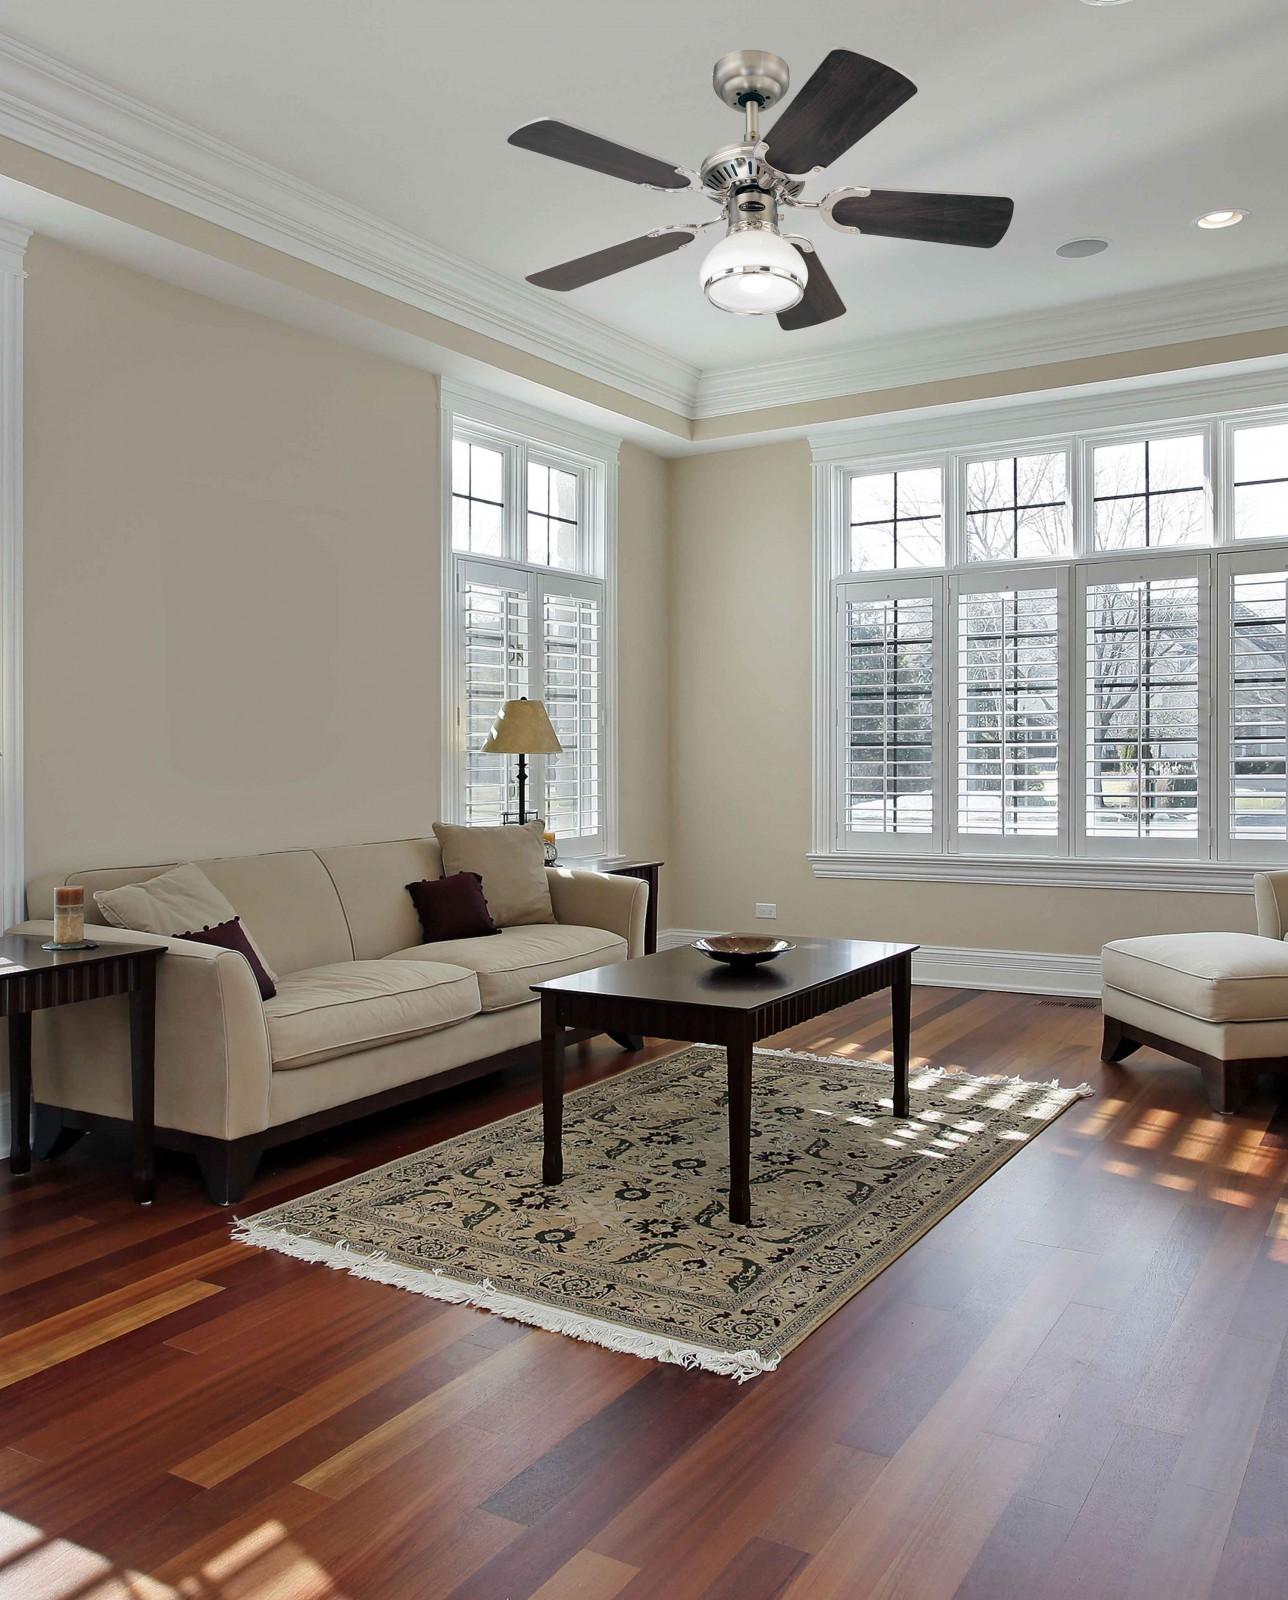 westinghouse deckenventilator princess radiance 90 cm deckenventilator deckenventilatoren mit. Black Bedroom Furniture Sets. Home Design Ideas